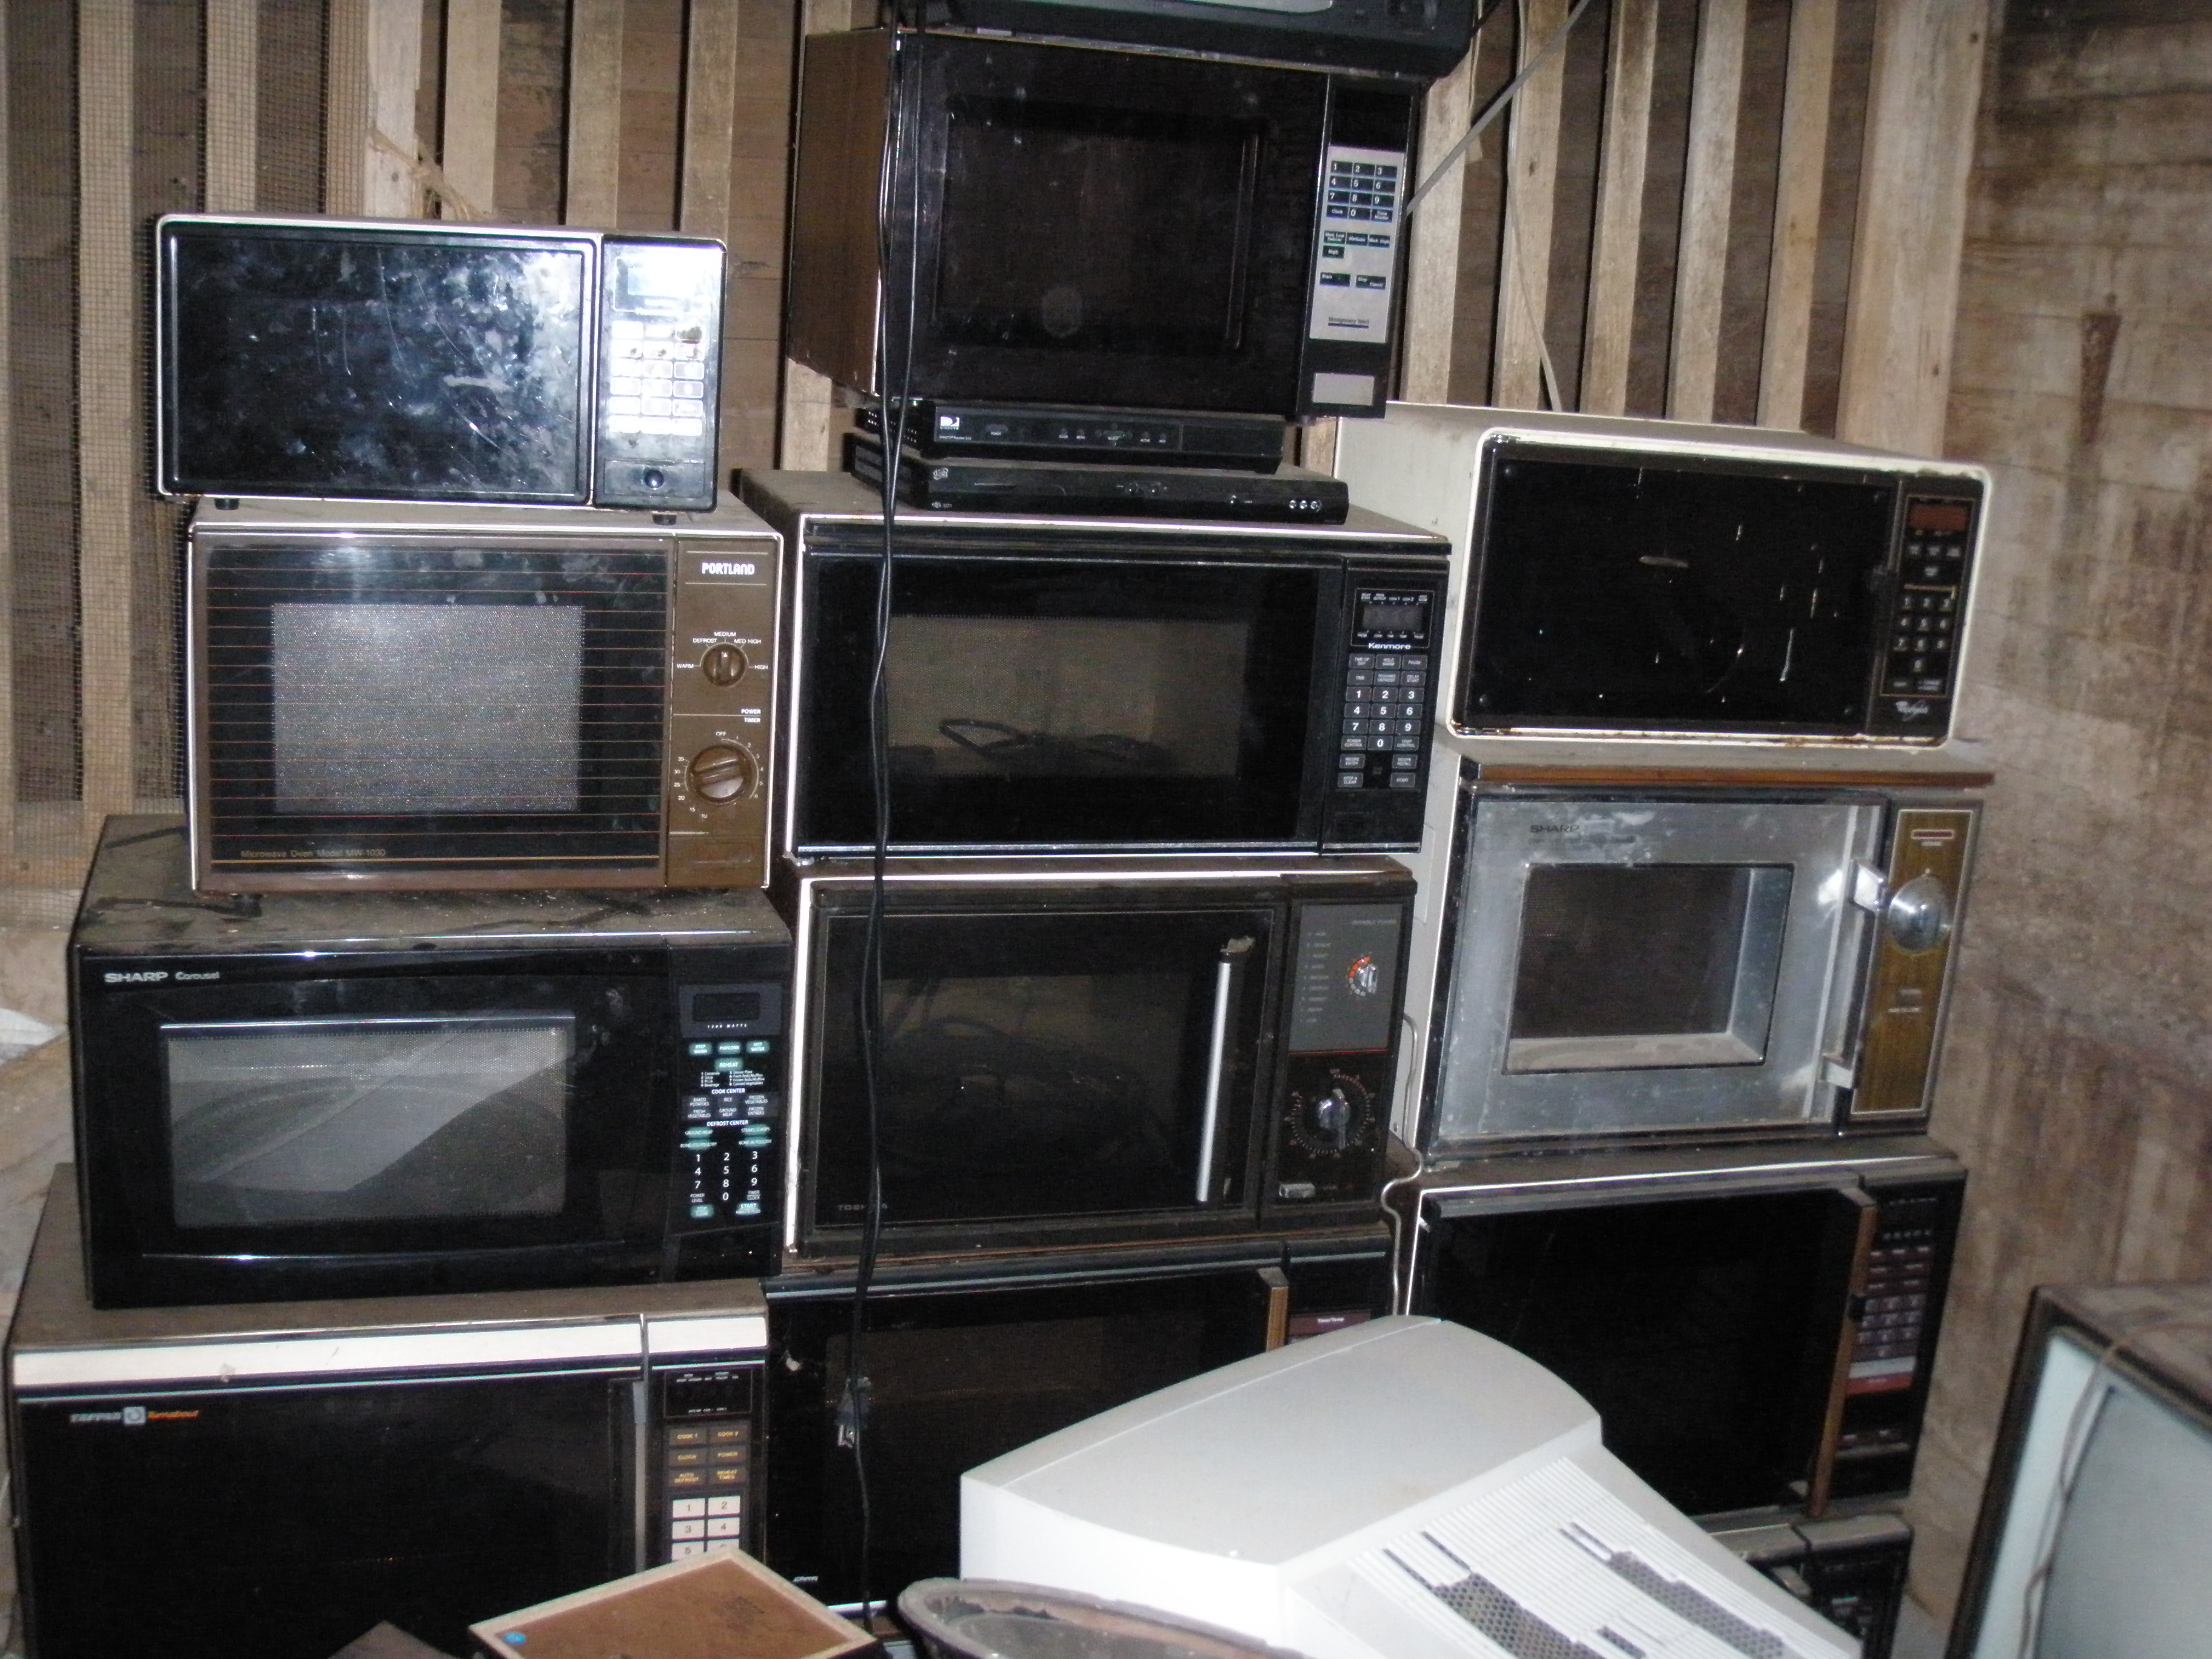 Commercial Kitchen Range Hood